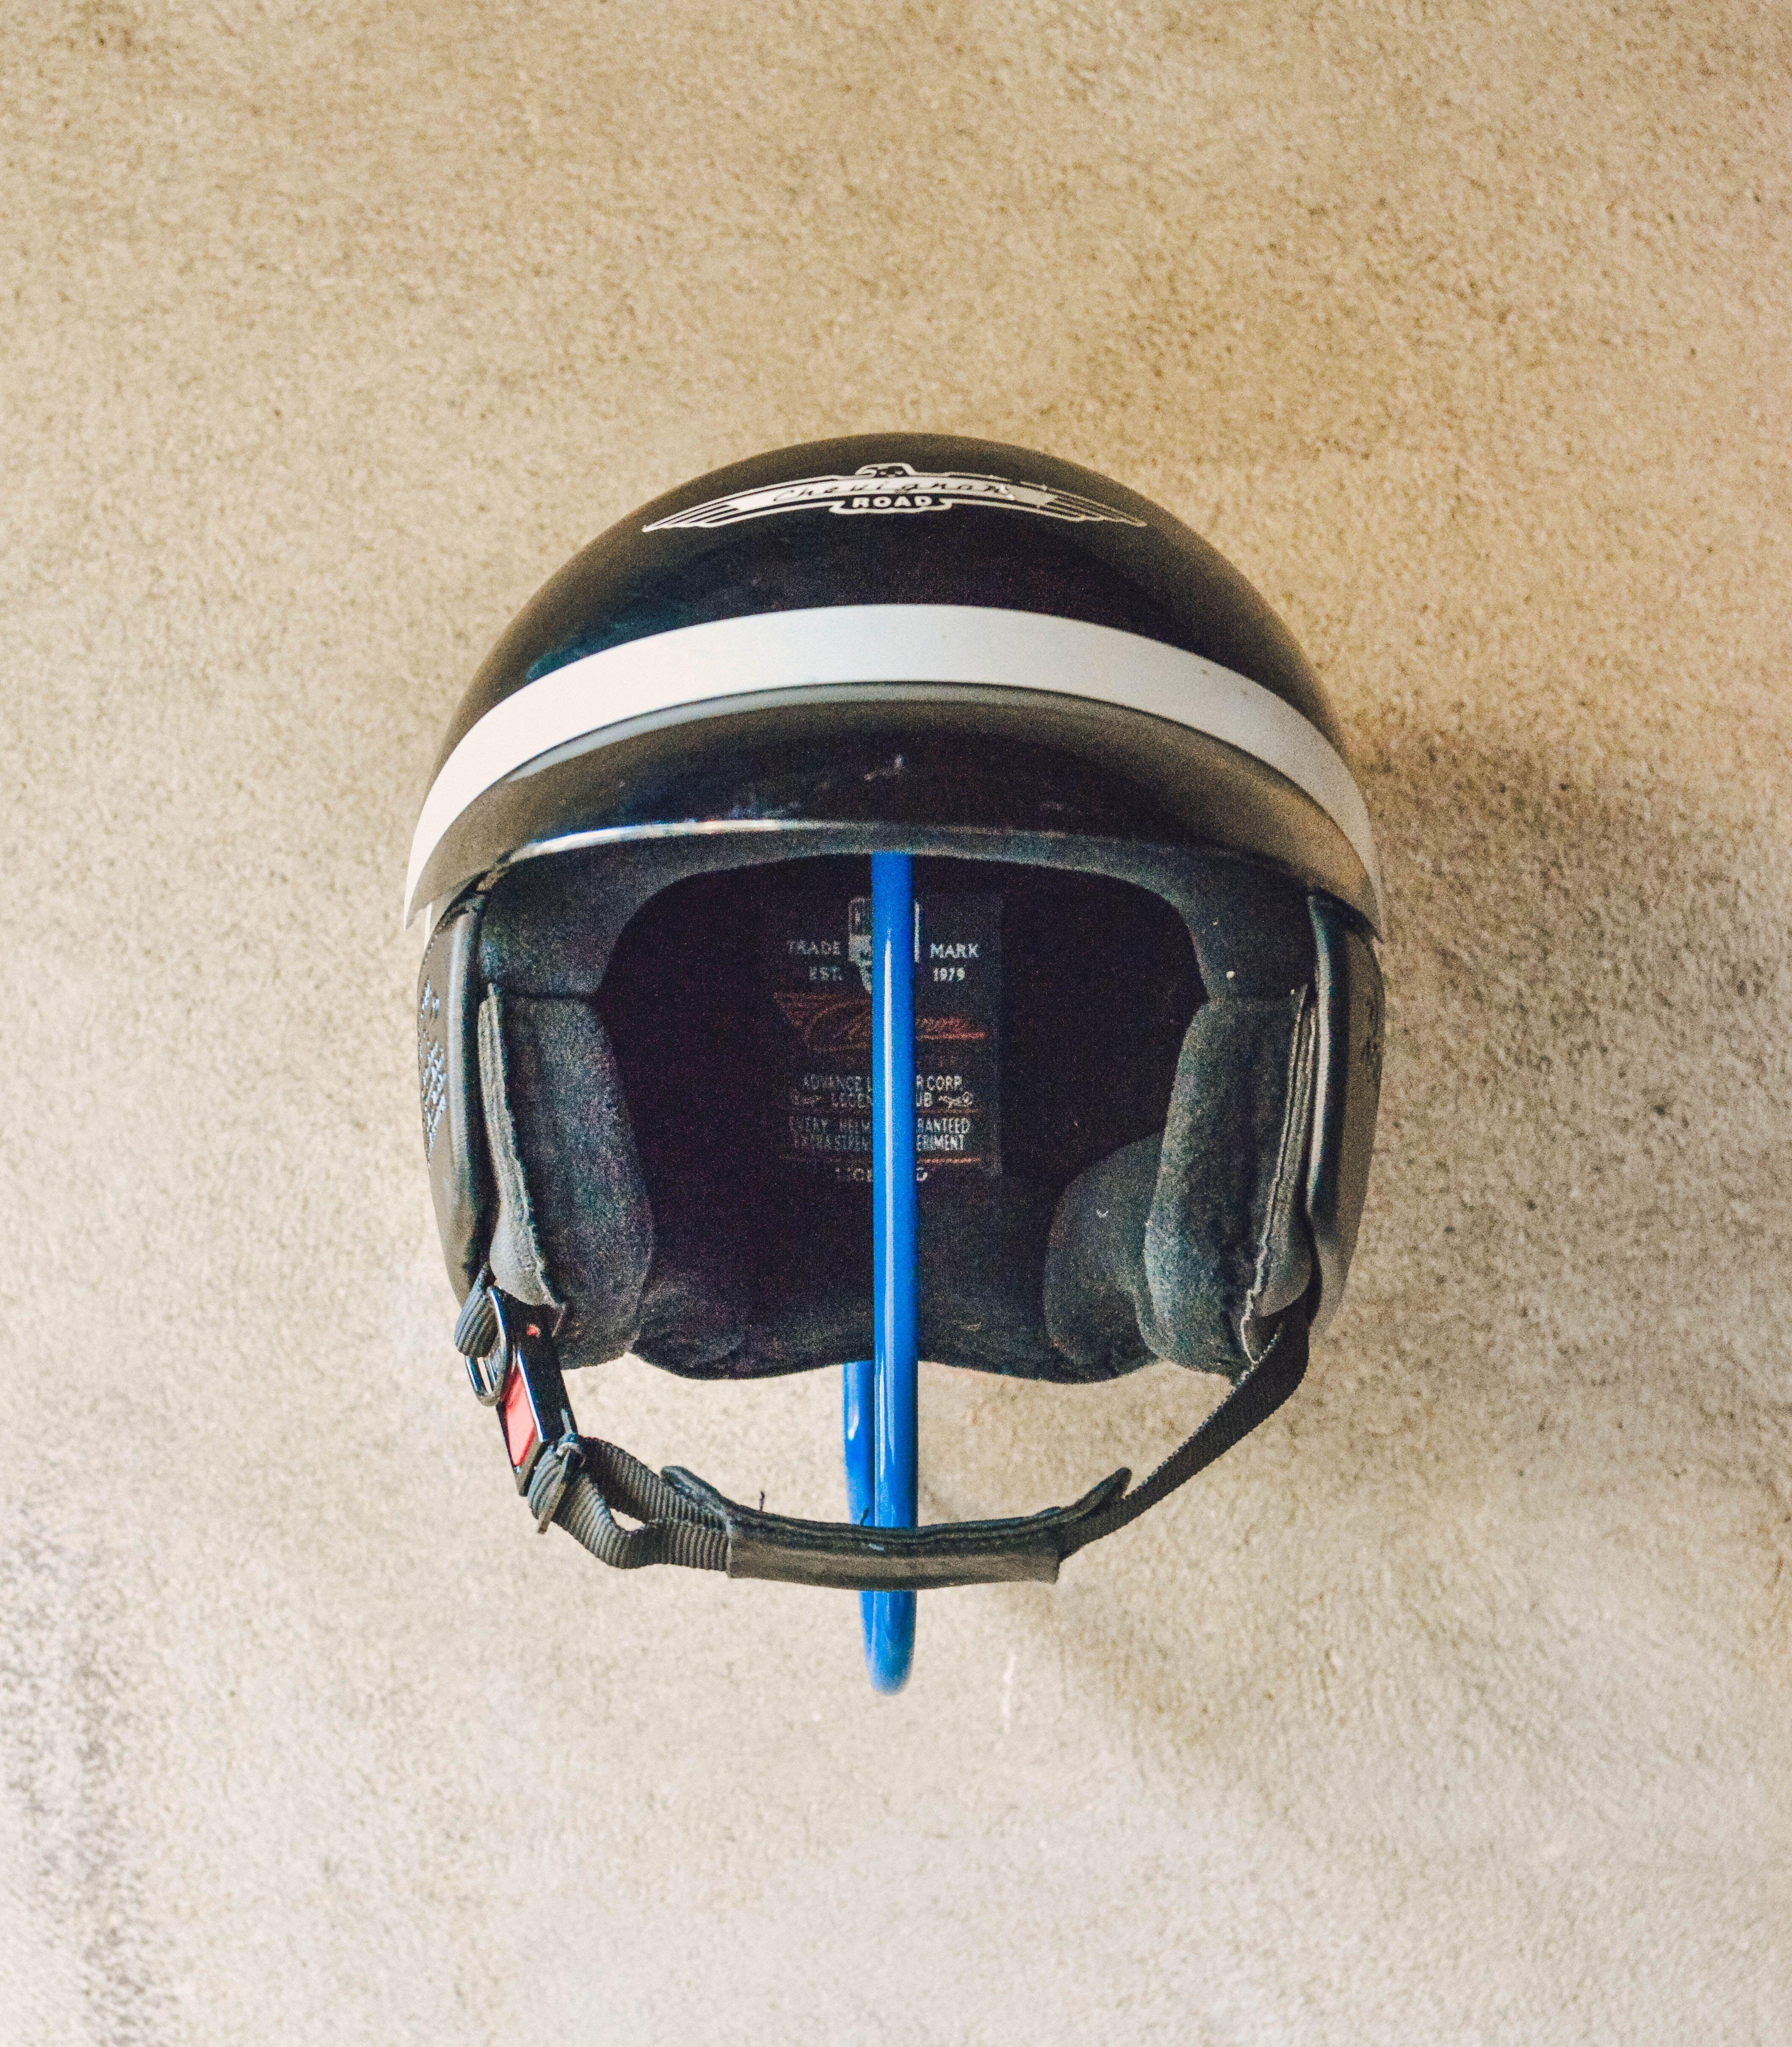 Porte Casque Helmet Rack France Waynscot Motorcycle Helmet Accessoires Decor Interieur Handmade Biker I Porte Casque Casque Helmet Casque